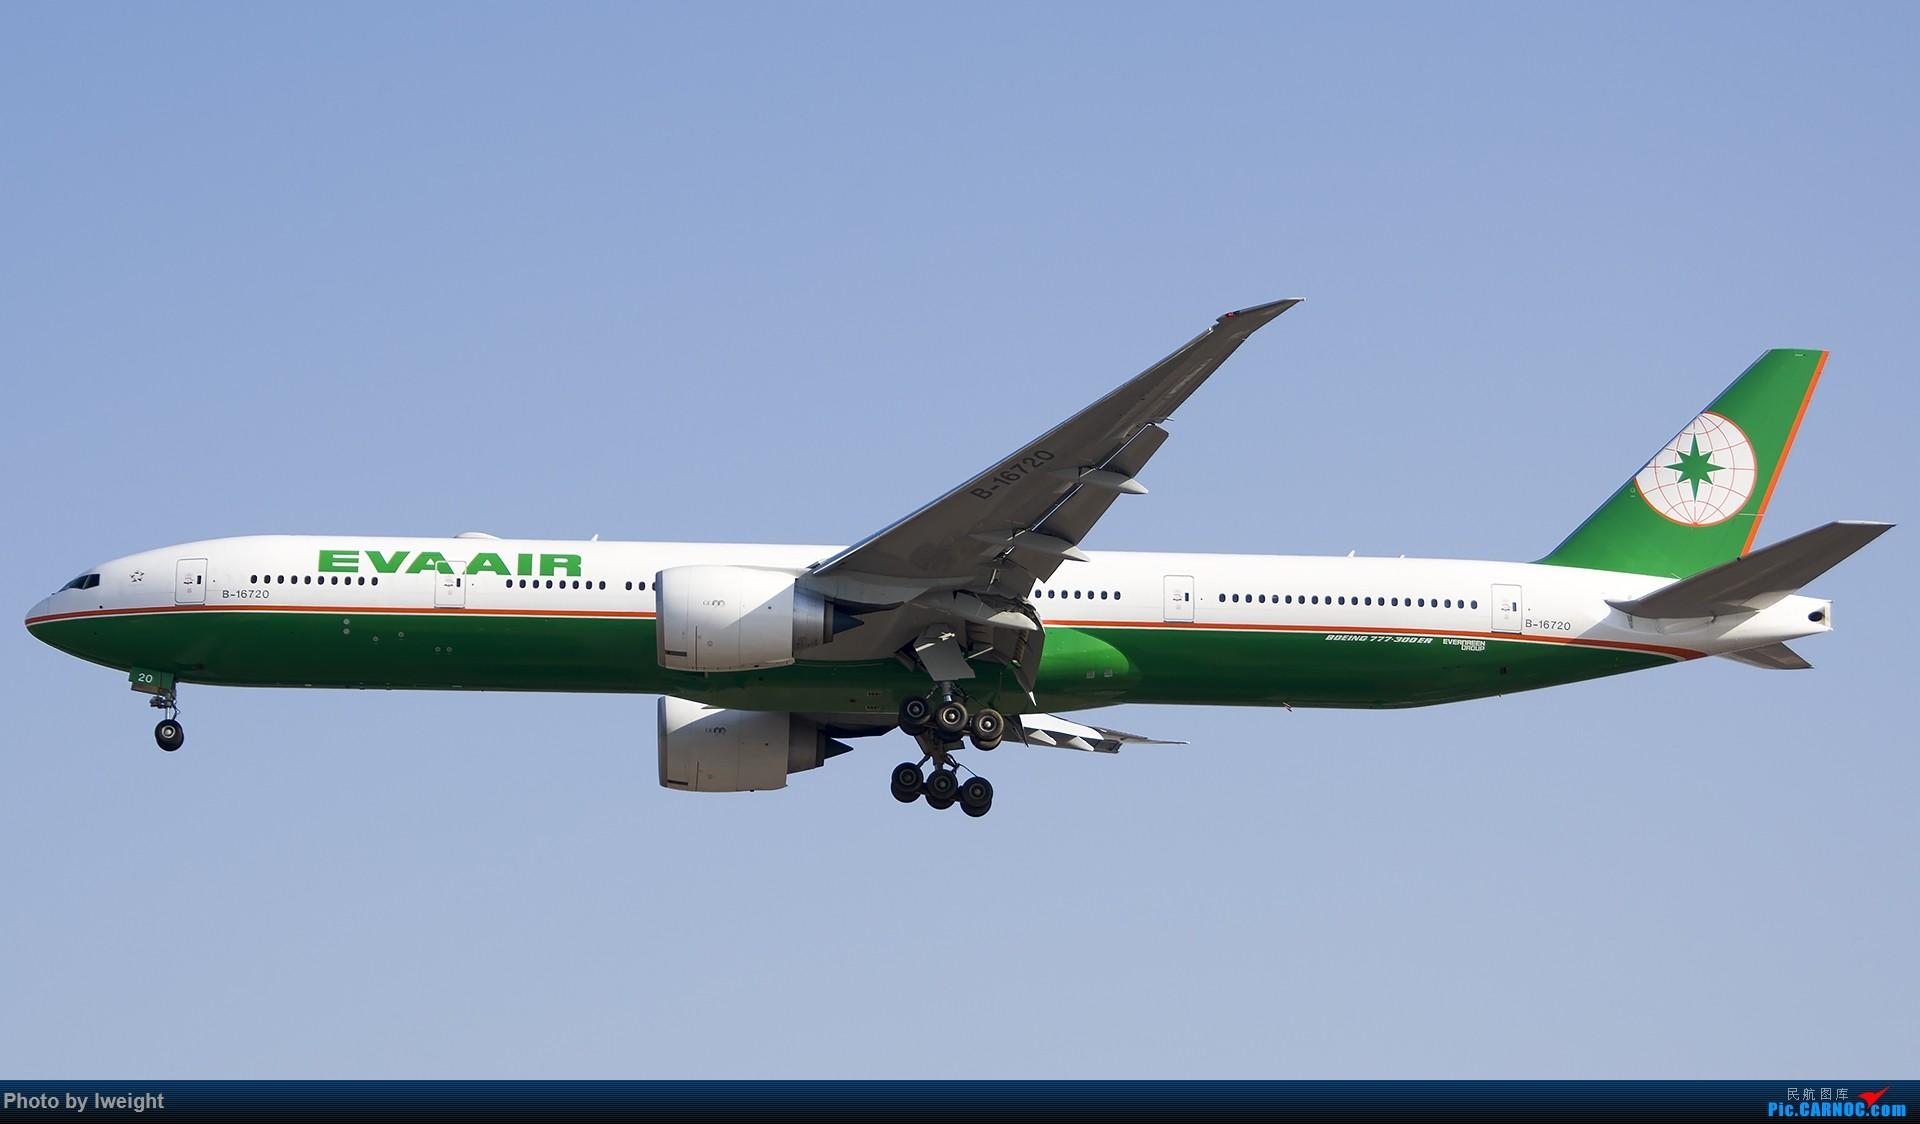 Re:[原创]2014-12-02 ZBAA随拍 BOEING 777-300 B-16720 中国北京首都国际机场